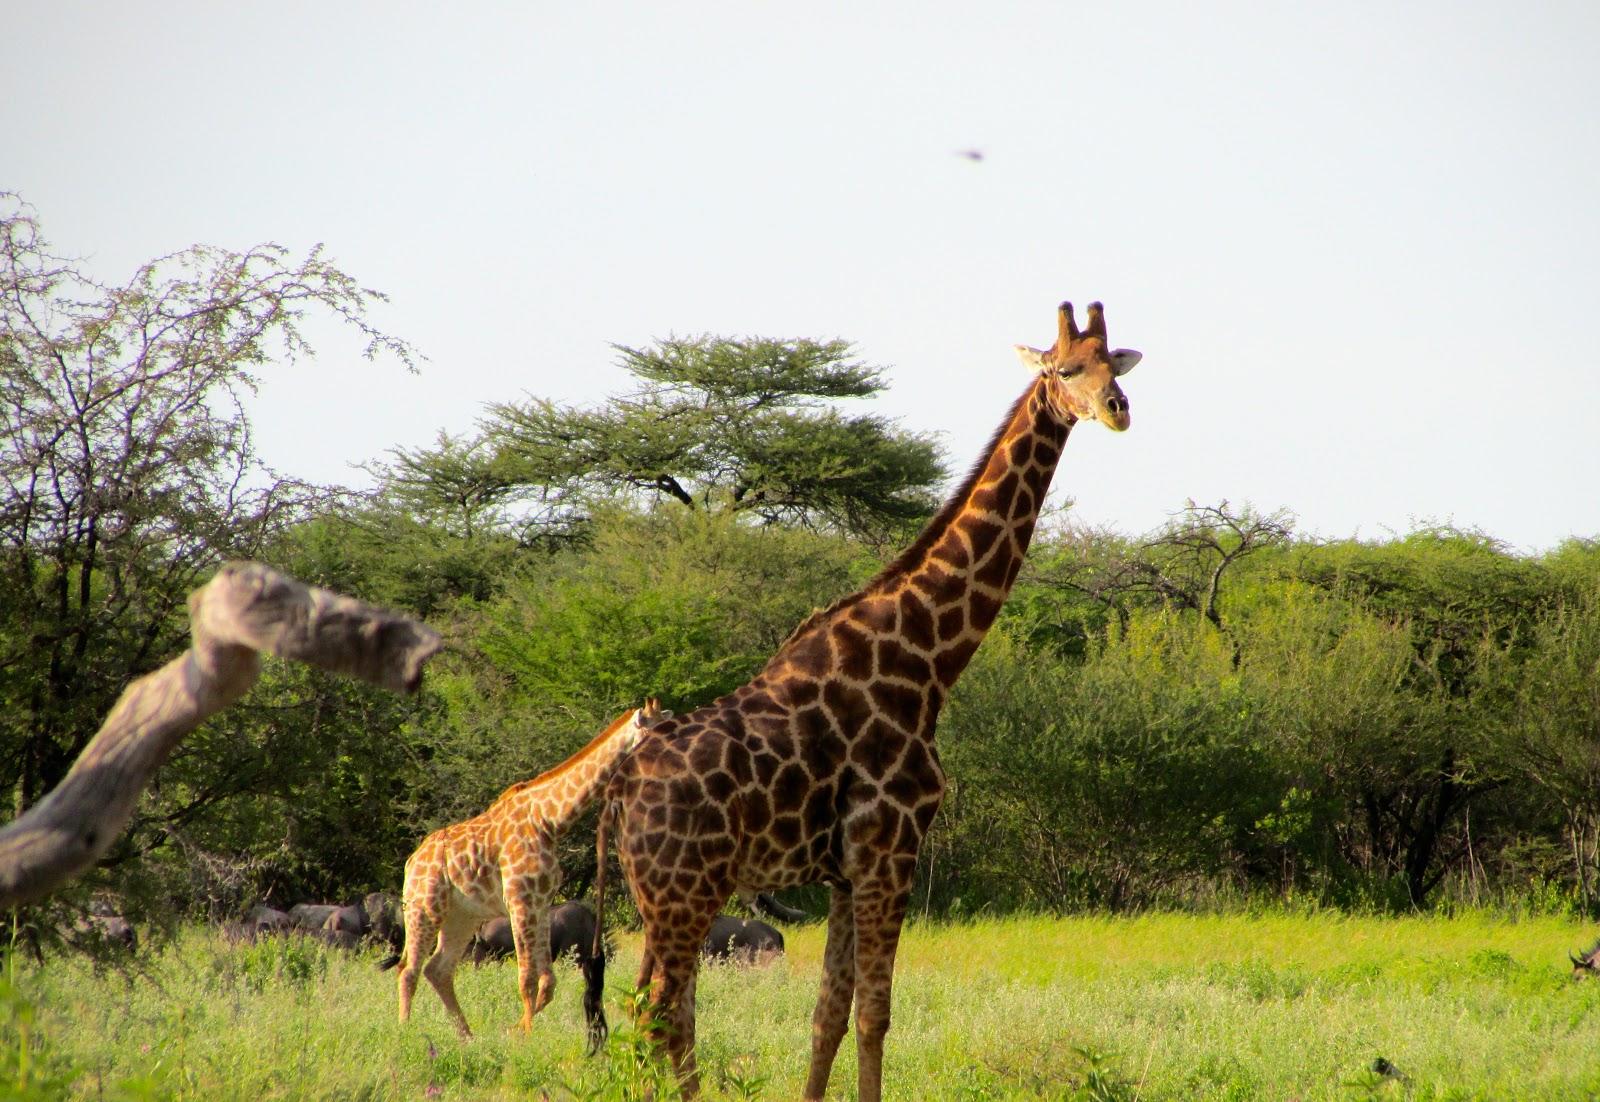 La Vie De Cyclisme Lions Zebras And Giraffes Oh My